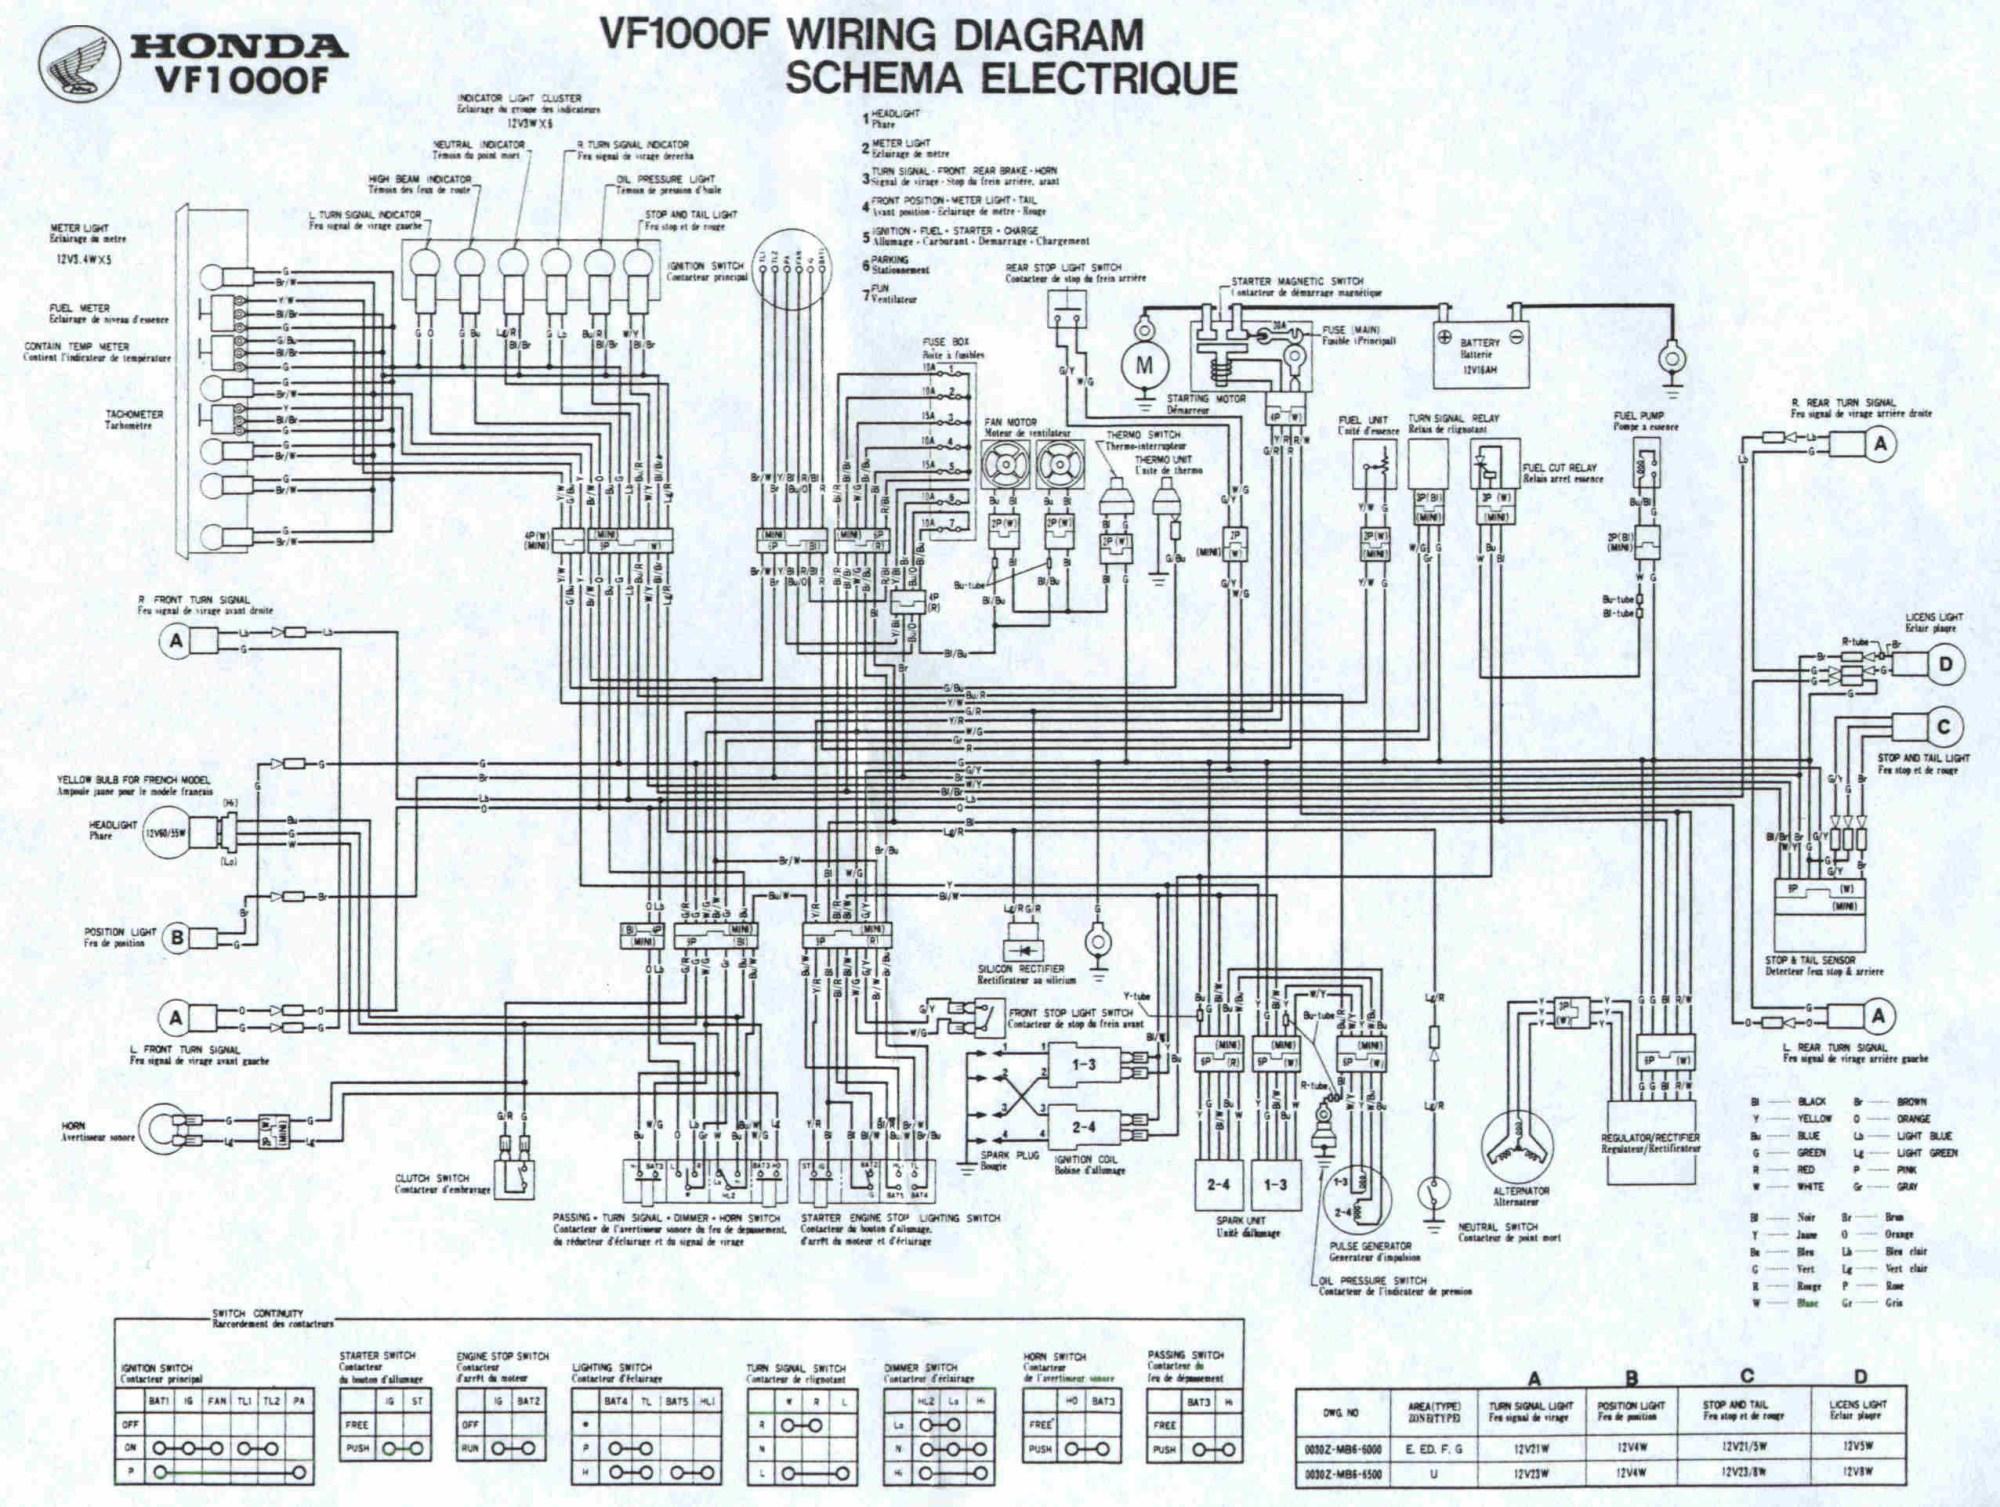 hight resolution of manuali di manutenzione moto duomoto 97 cbr1100xx wiring diagram 1997 honda cbr1100xx wiring diagram